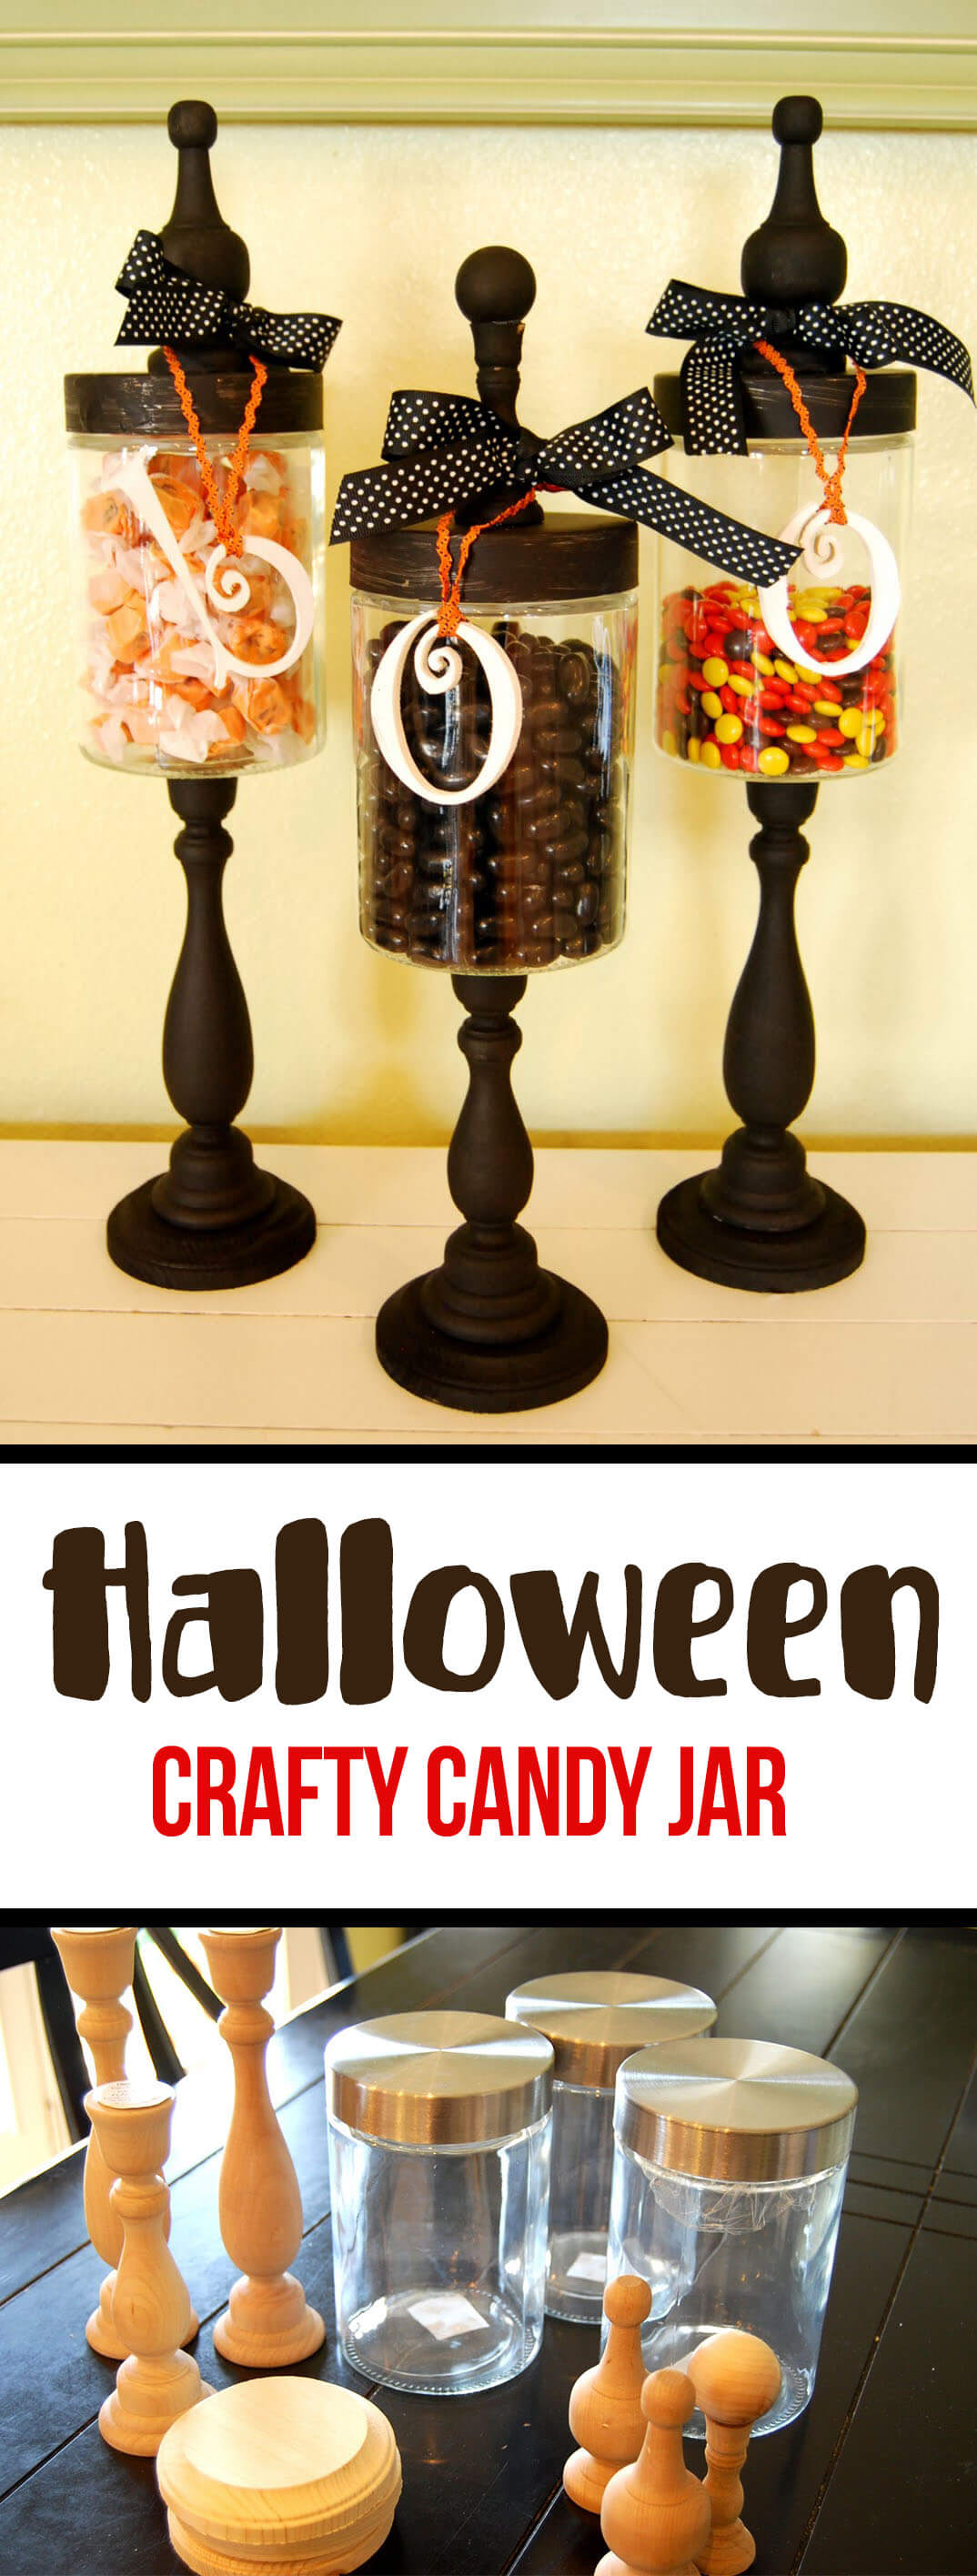 30 Best Diy Mason Jar Halloween Crafts Ideas And Designs For 2021